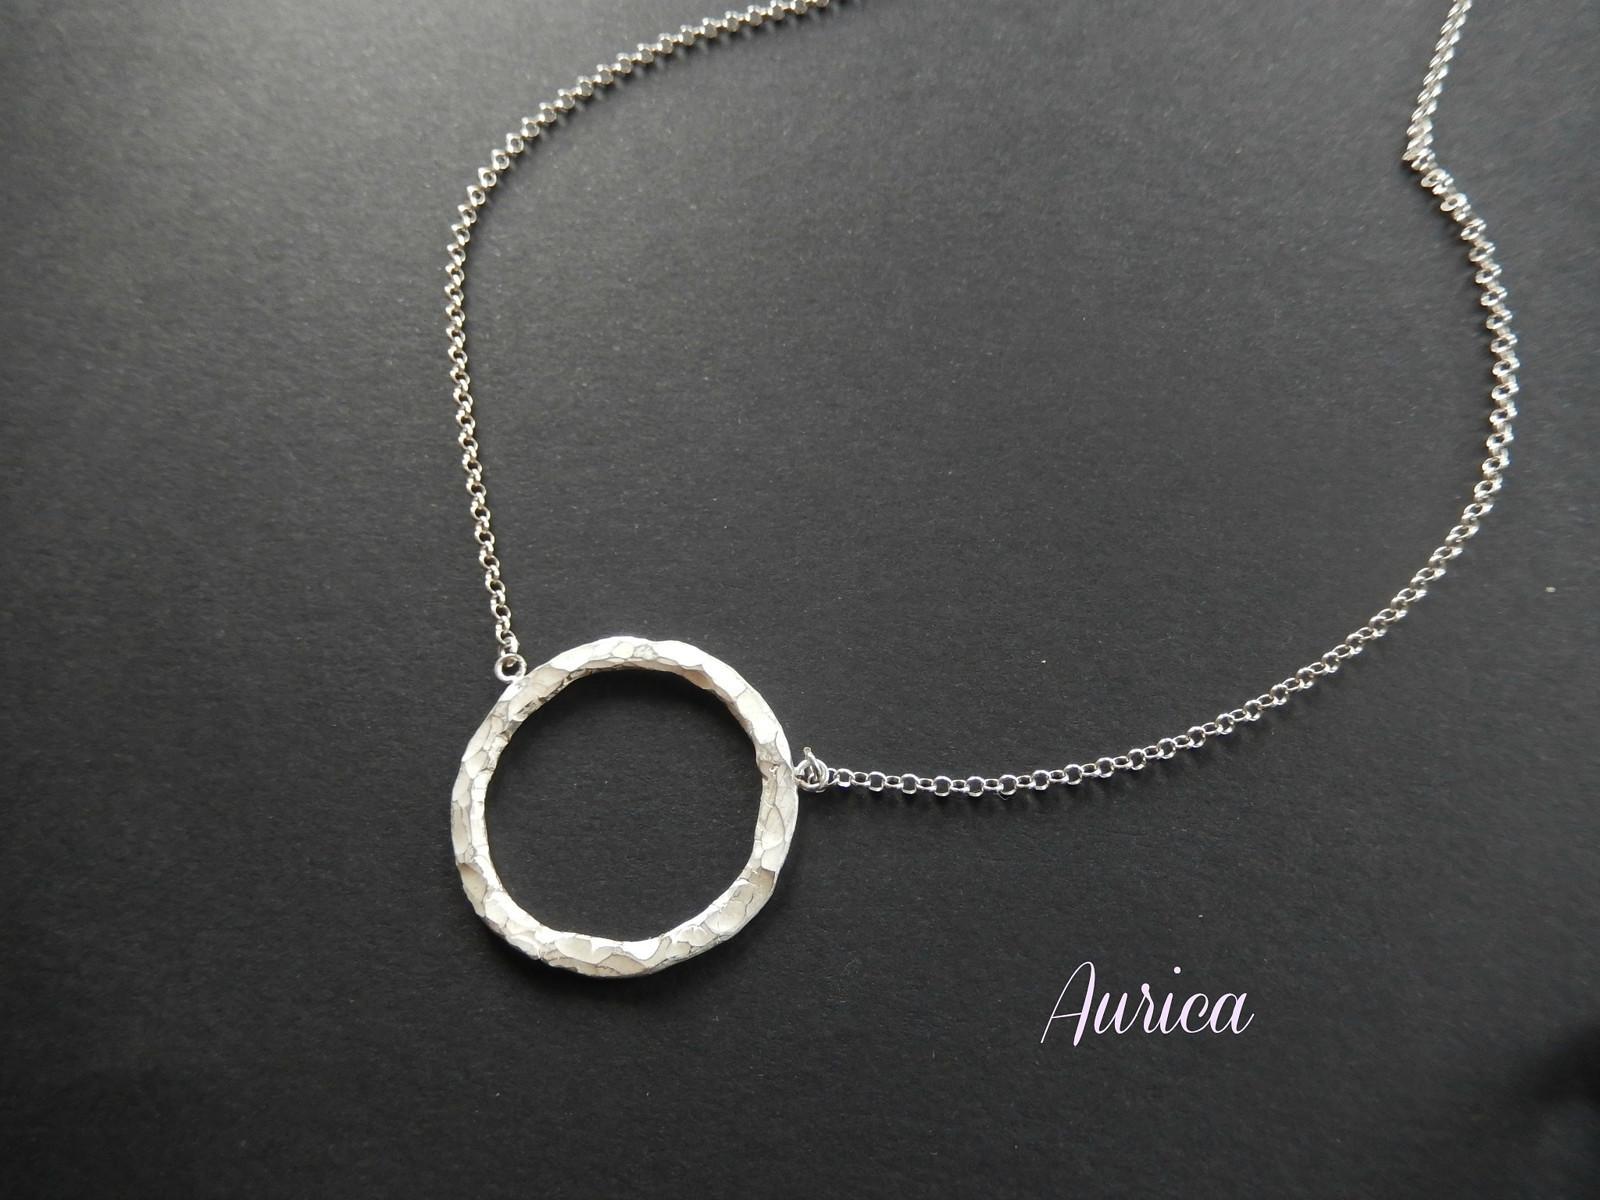 Stříbrné tepané kolečko - Ag 925 1000   Zboží prodejce Aurica  f870663cee0